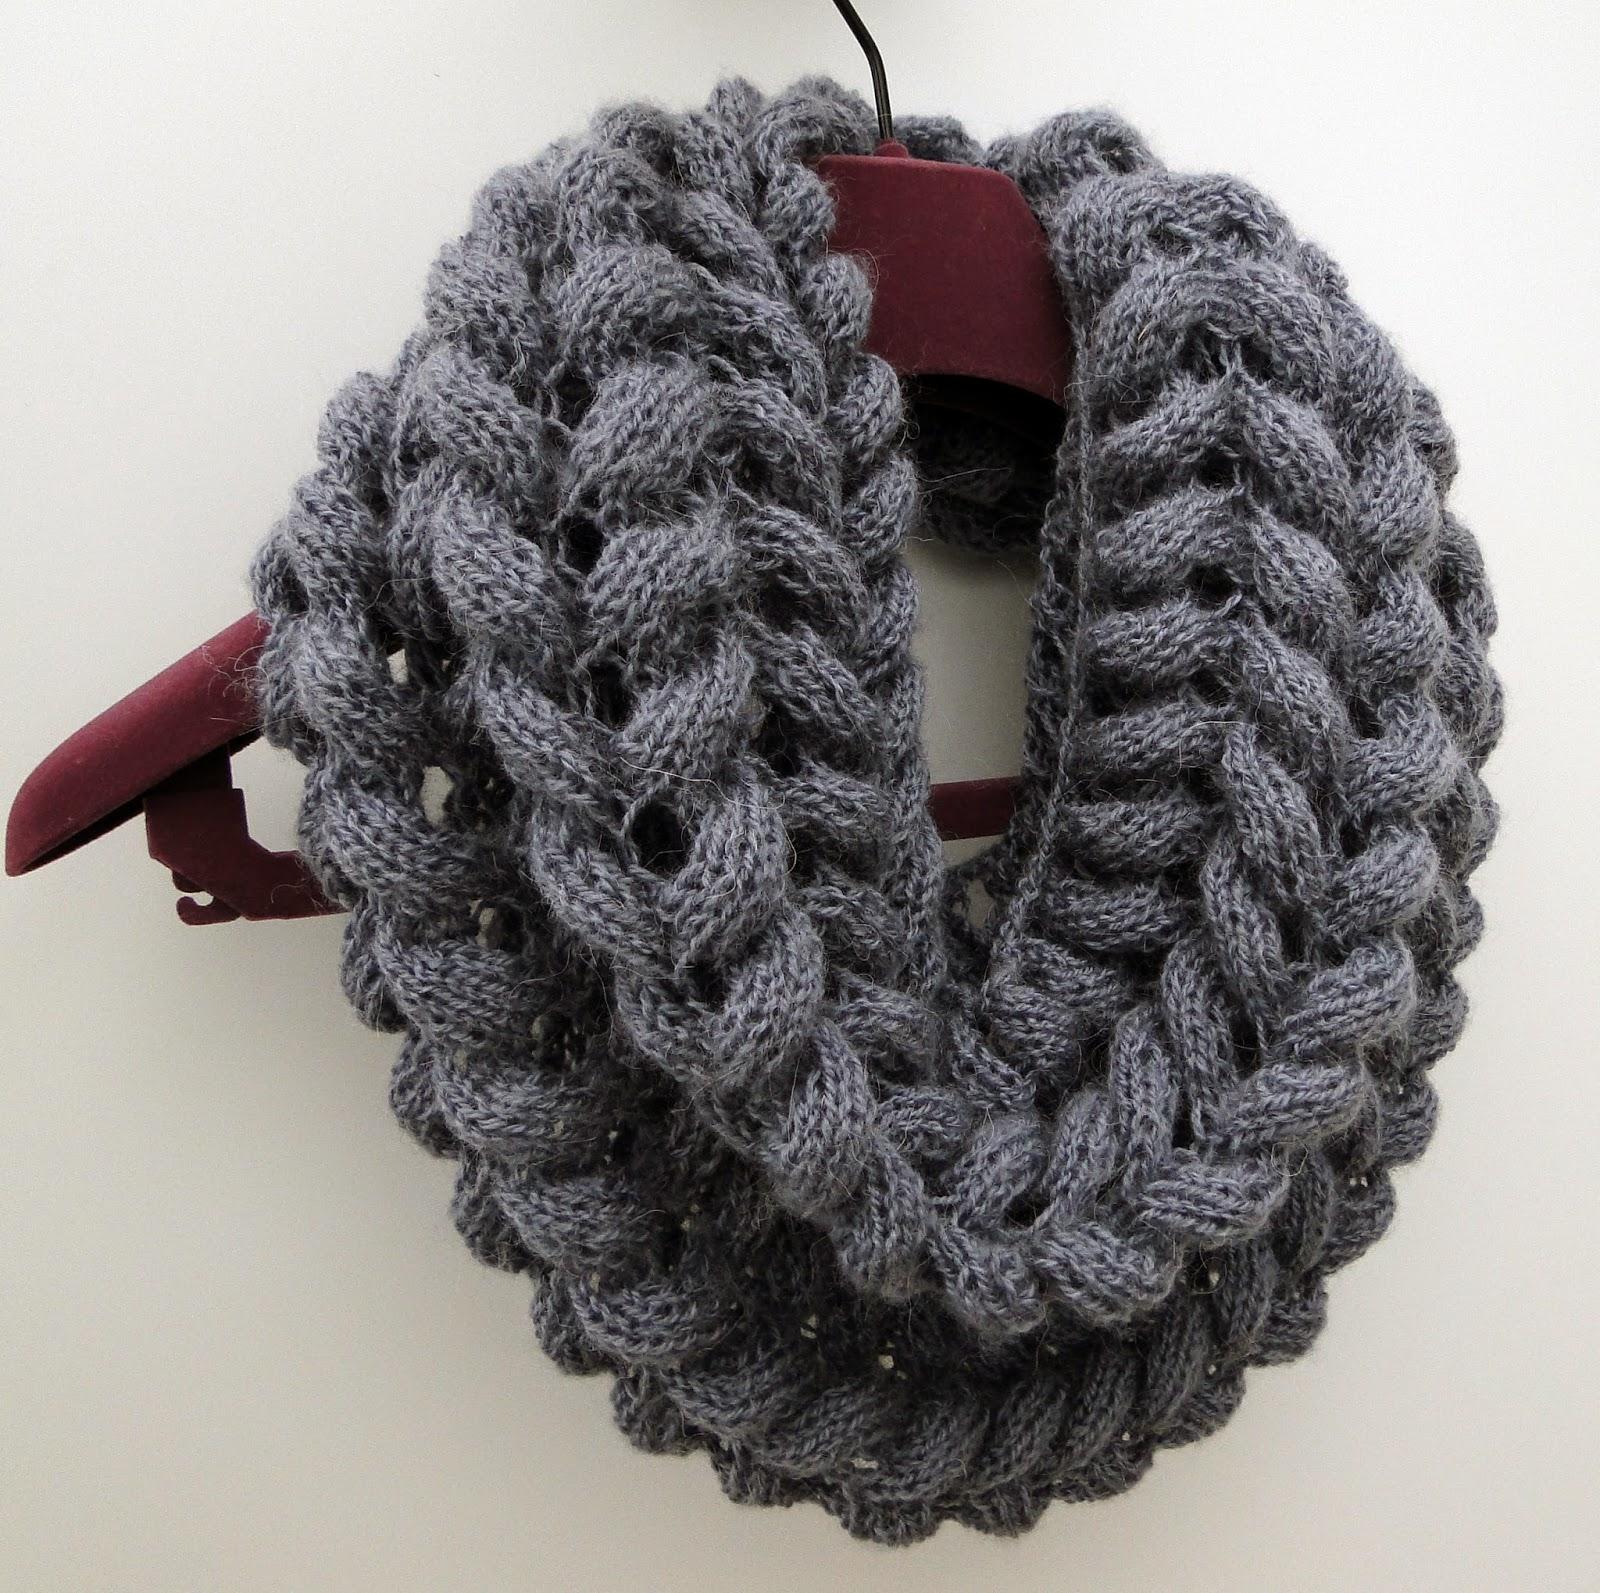 3 Rabbits Patterns: Scarf Cowl Knitting Pattern